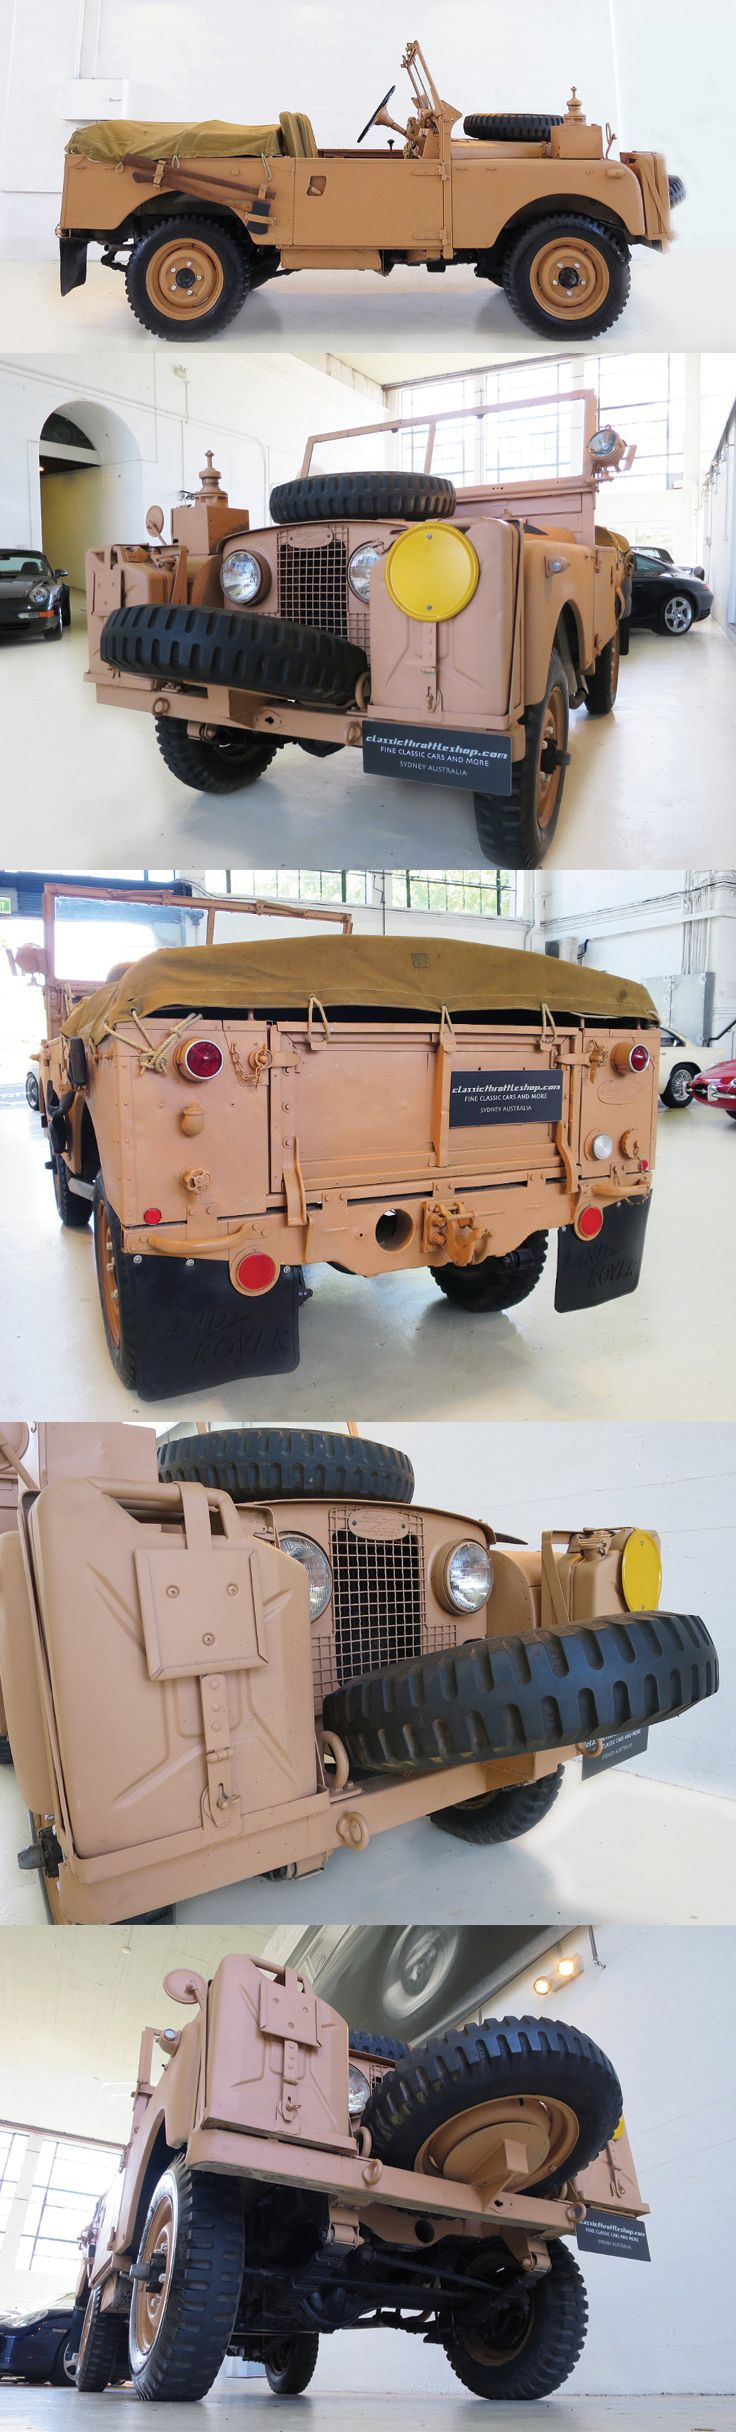 1954 Land Rover Series 1 Desert Rat